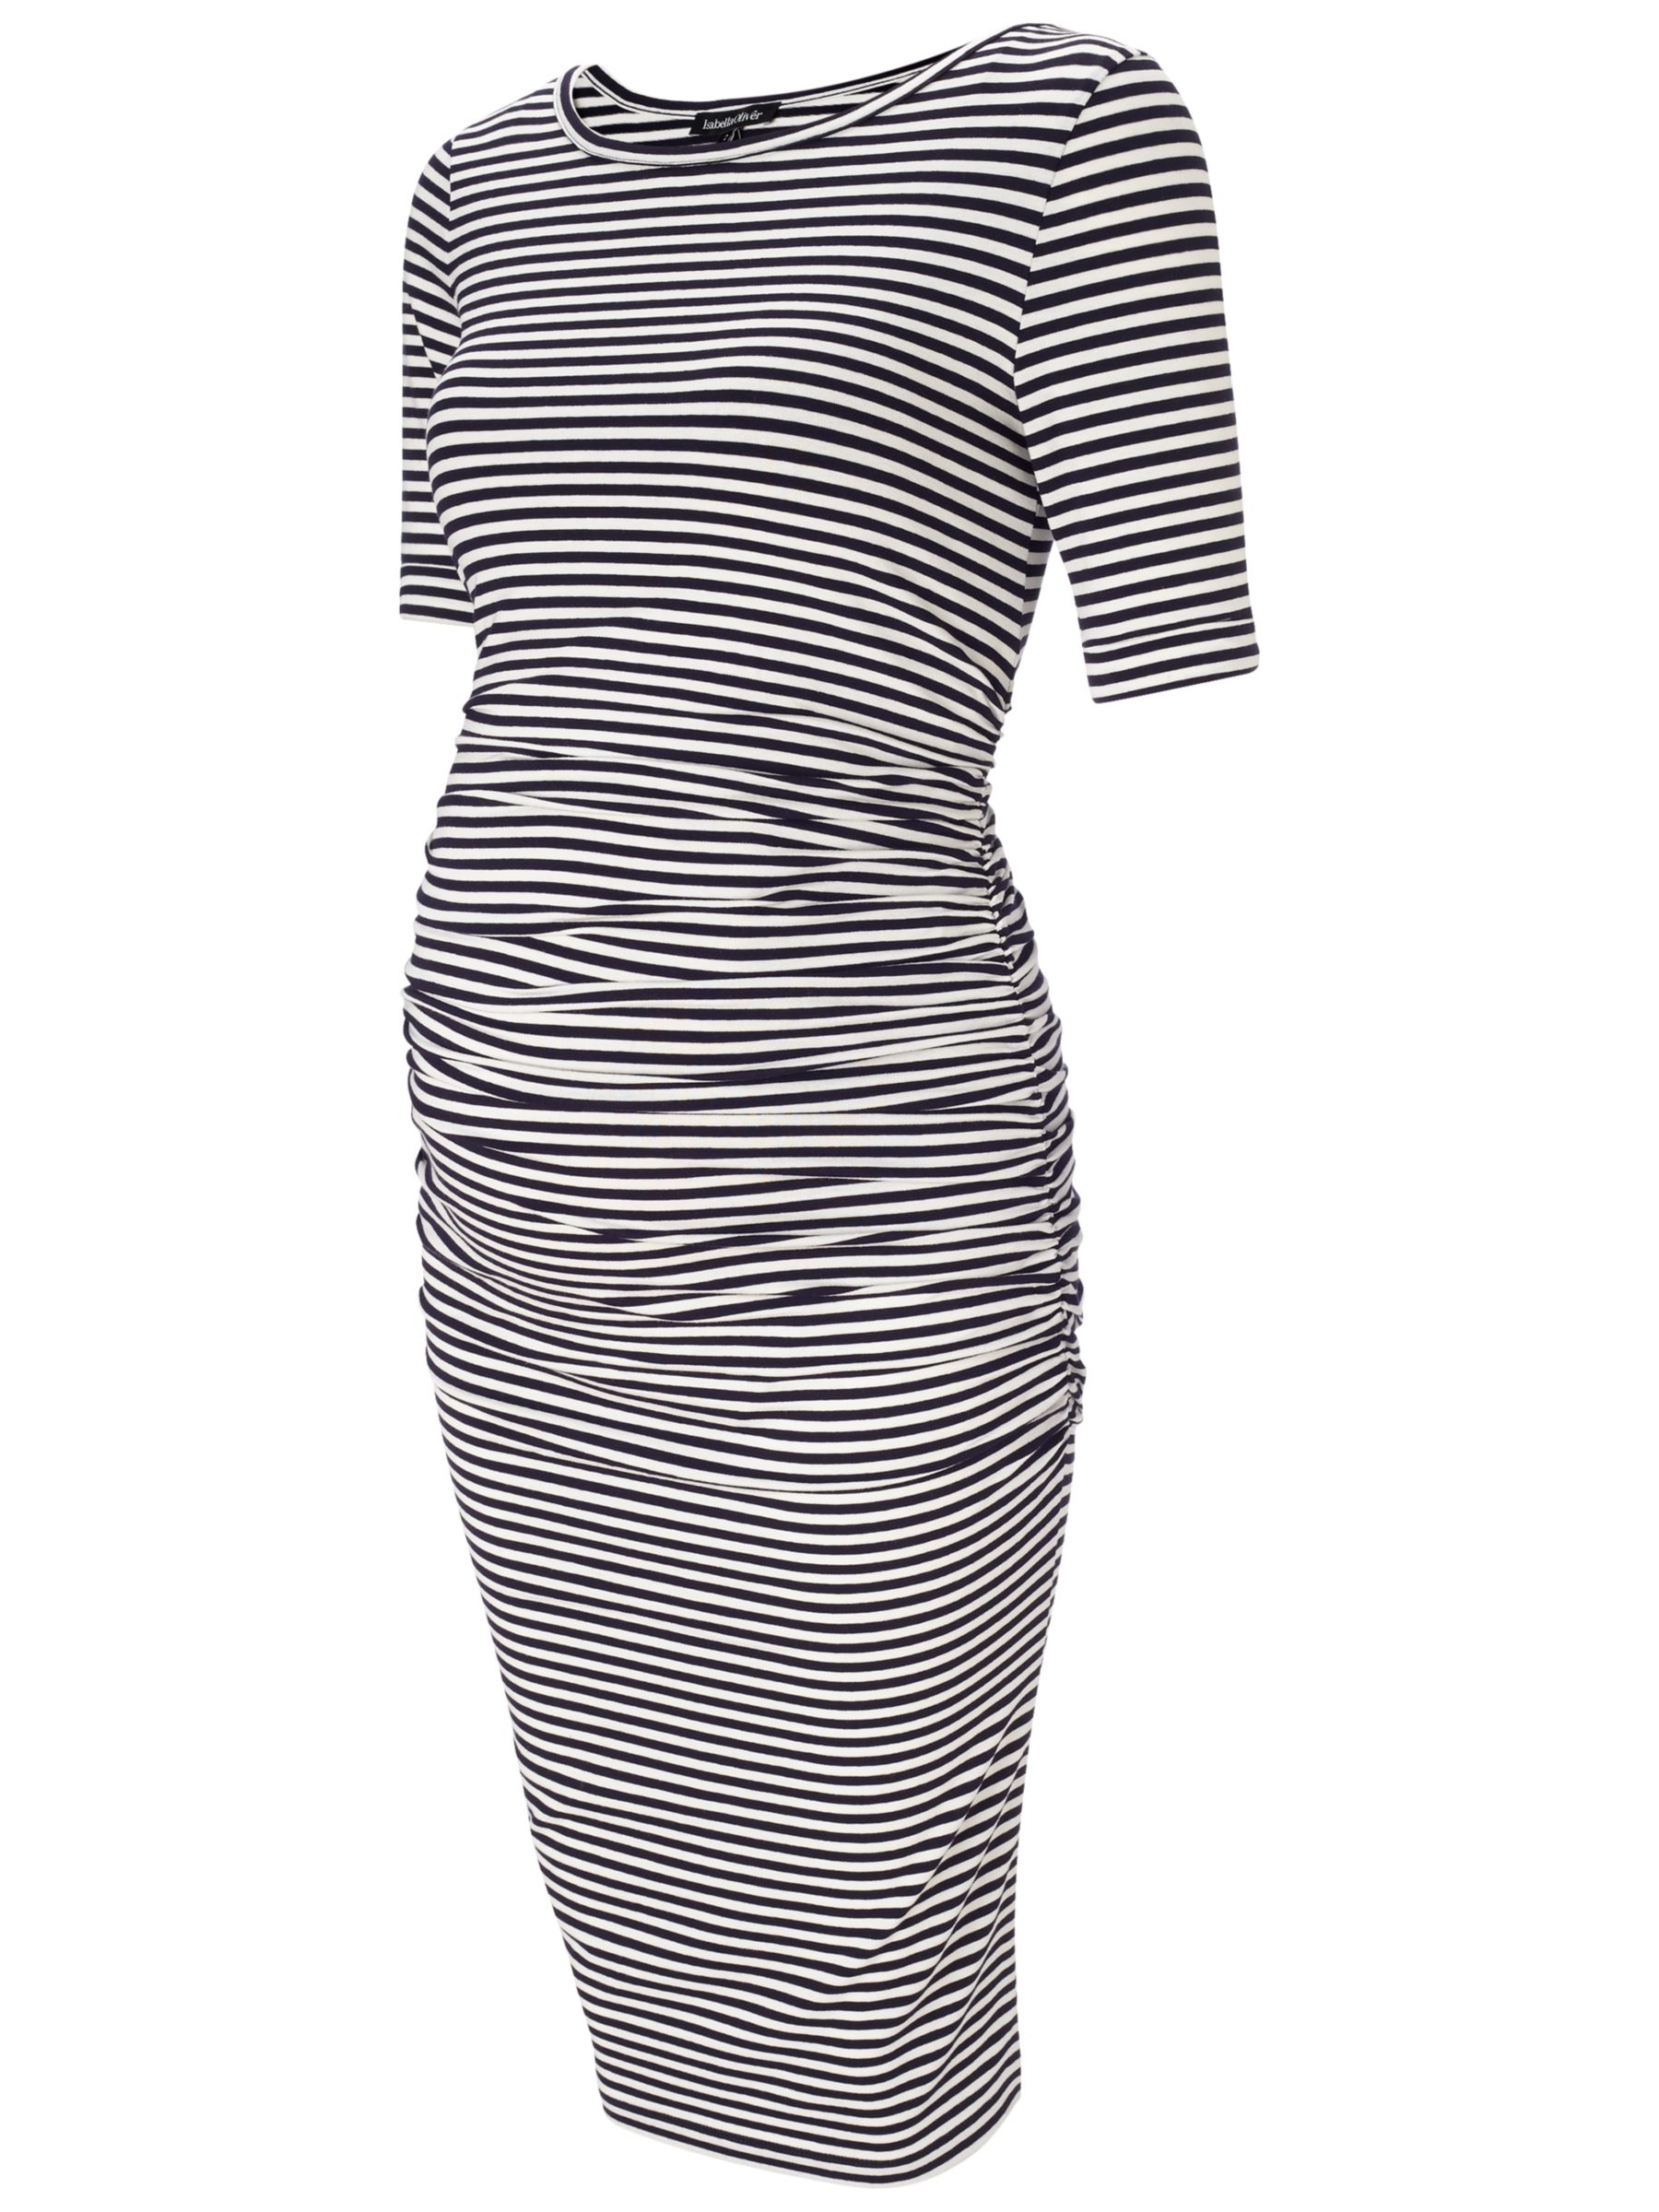 e5da9c414e1 Isabella Oliver Arlington Stripe Dress, Navy/White at John Lewis ...